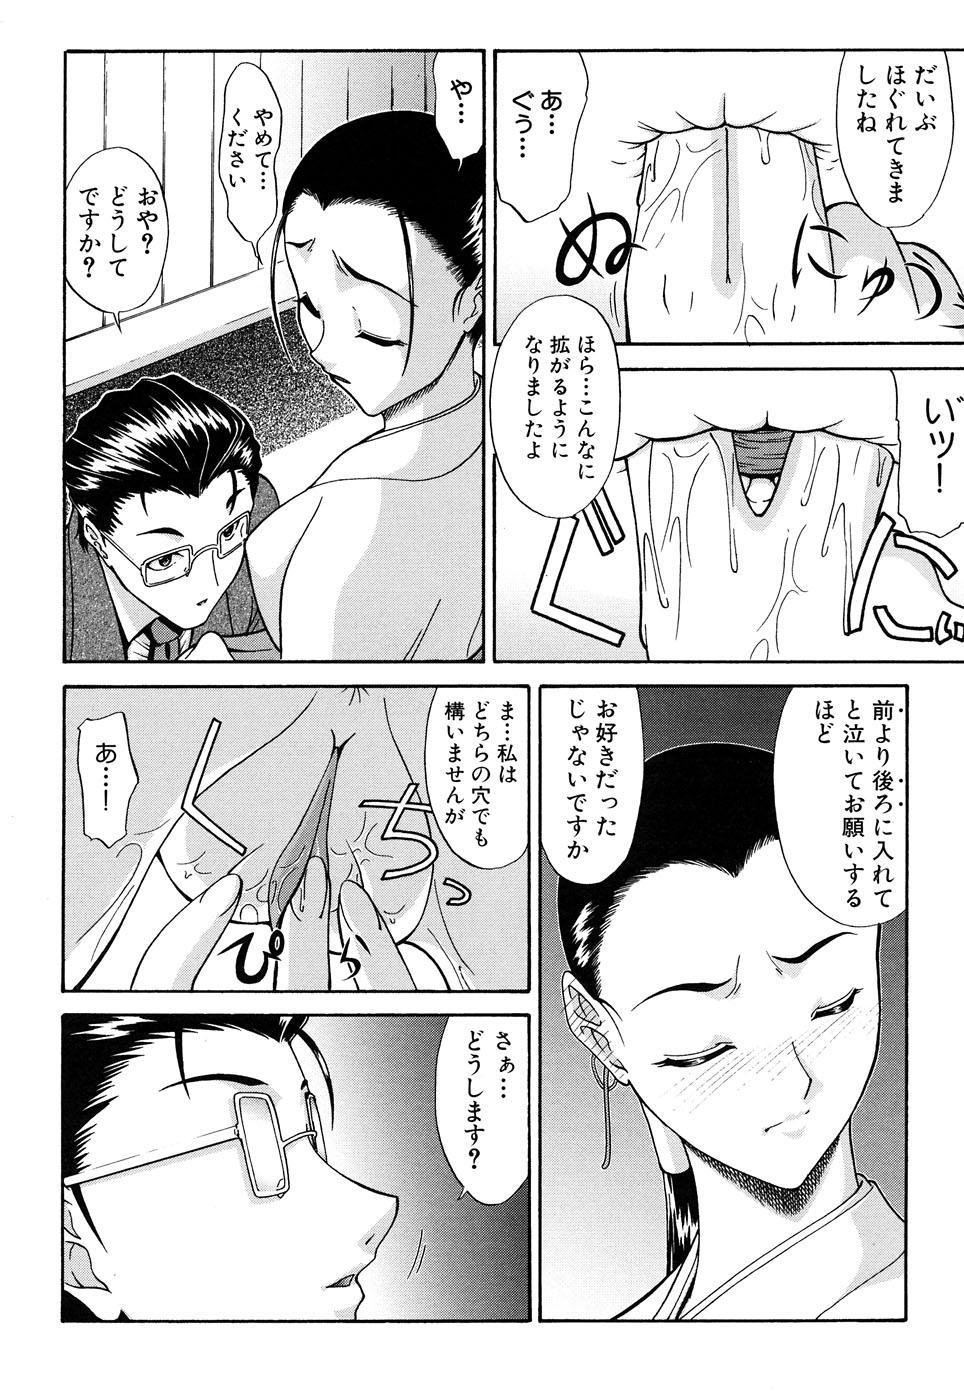 Fechikko VS Series ROUND.2 Miko San VS Maid San 20